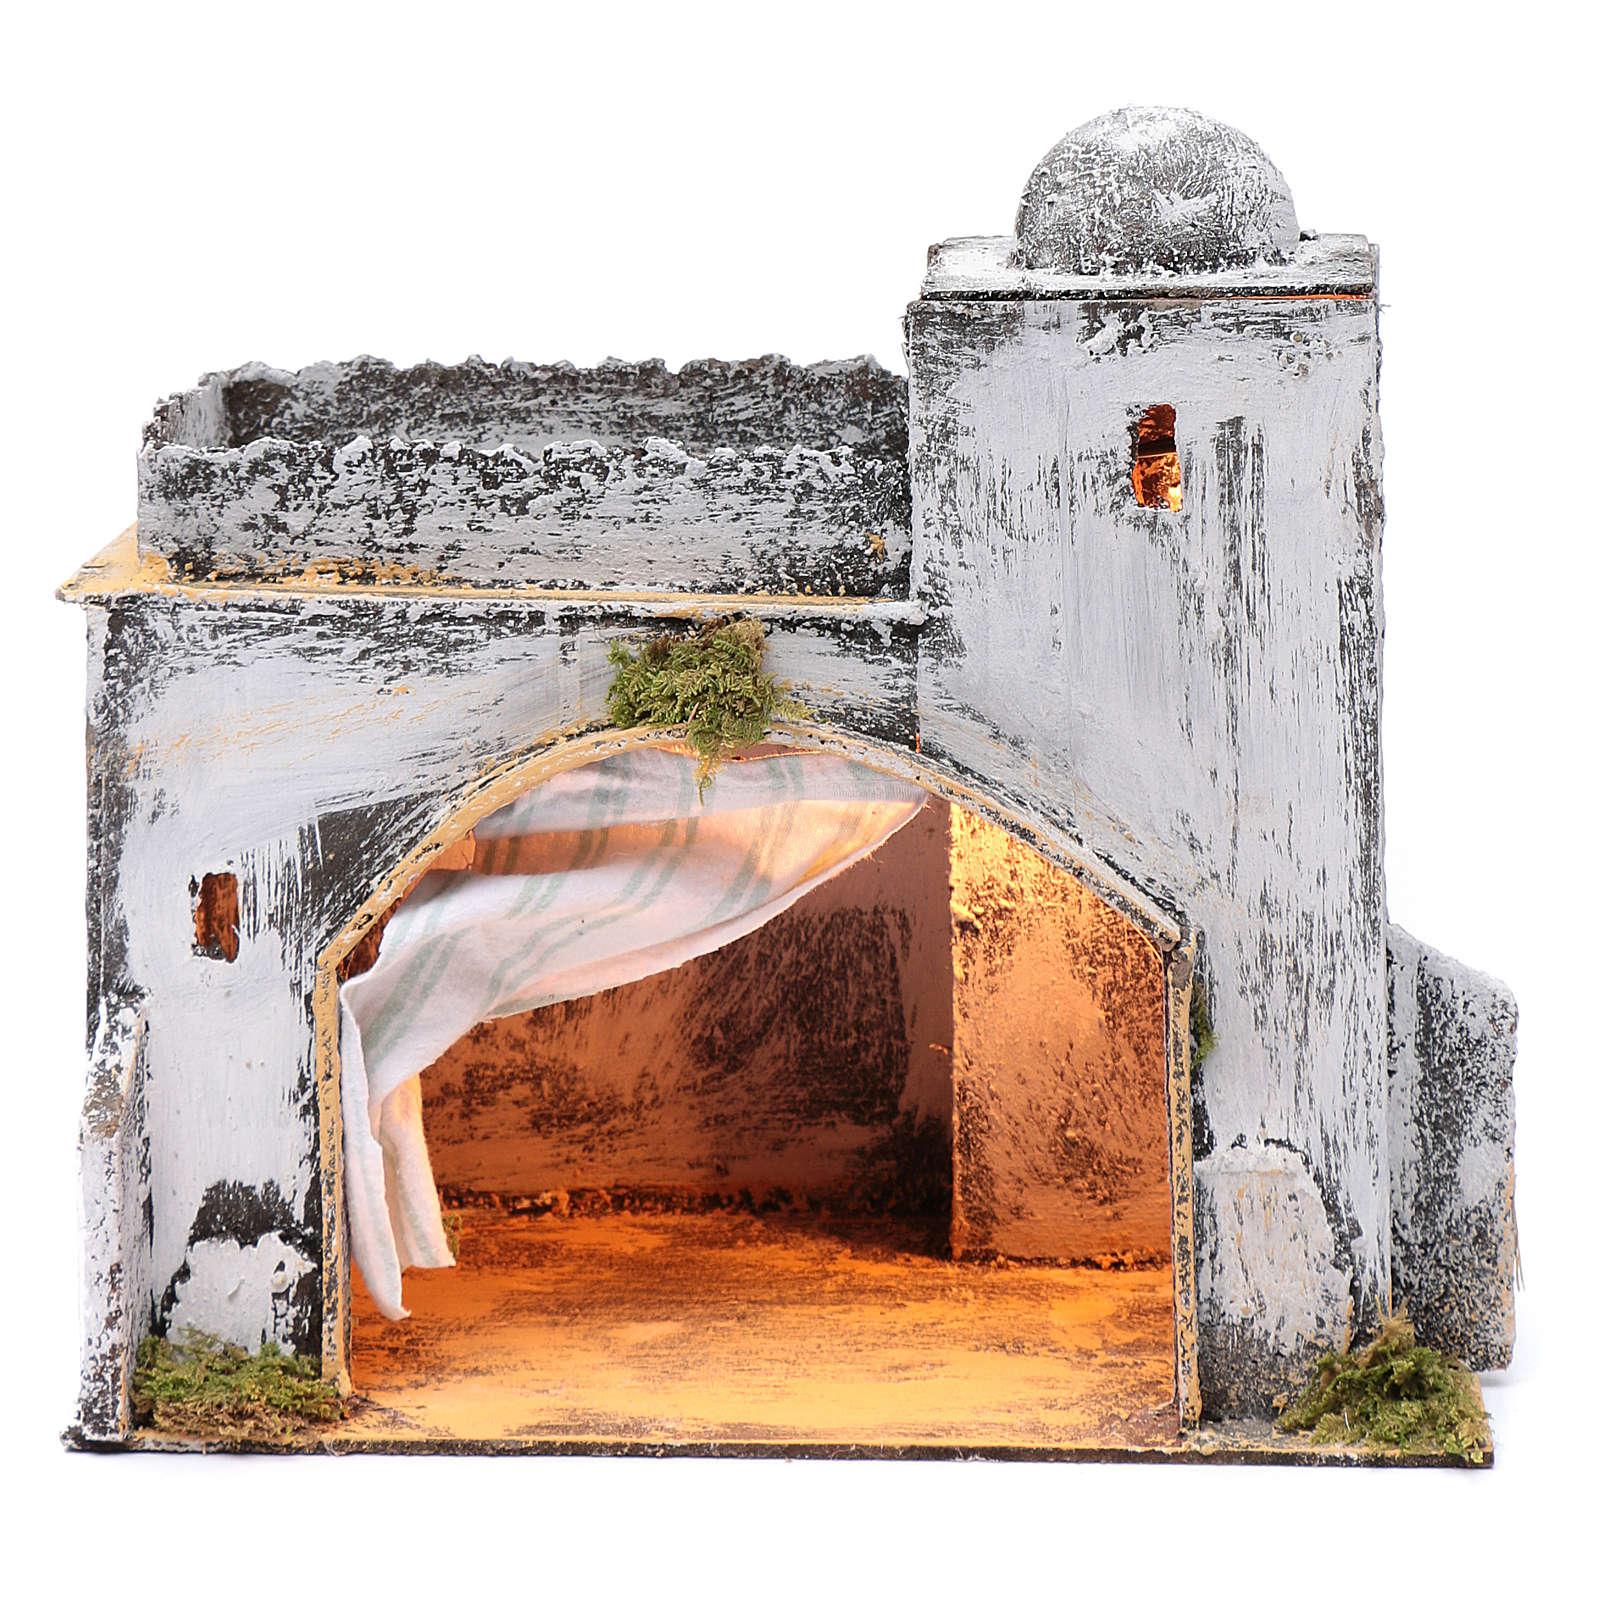 Ambientación árabe cabaña cortina belén Nápoles 30x30x20 cm 4